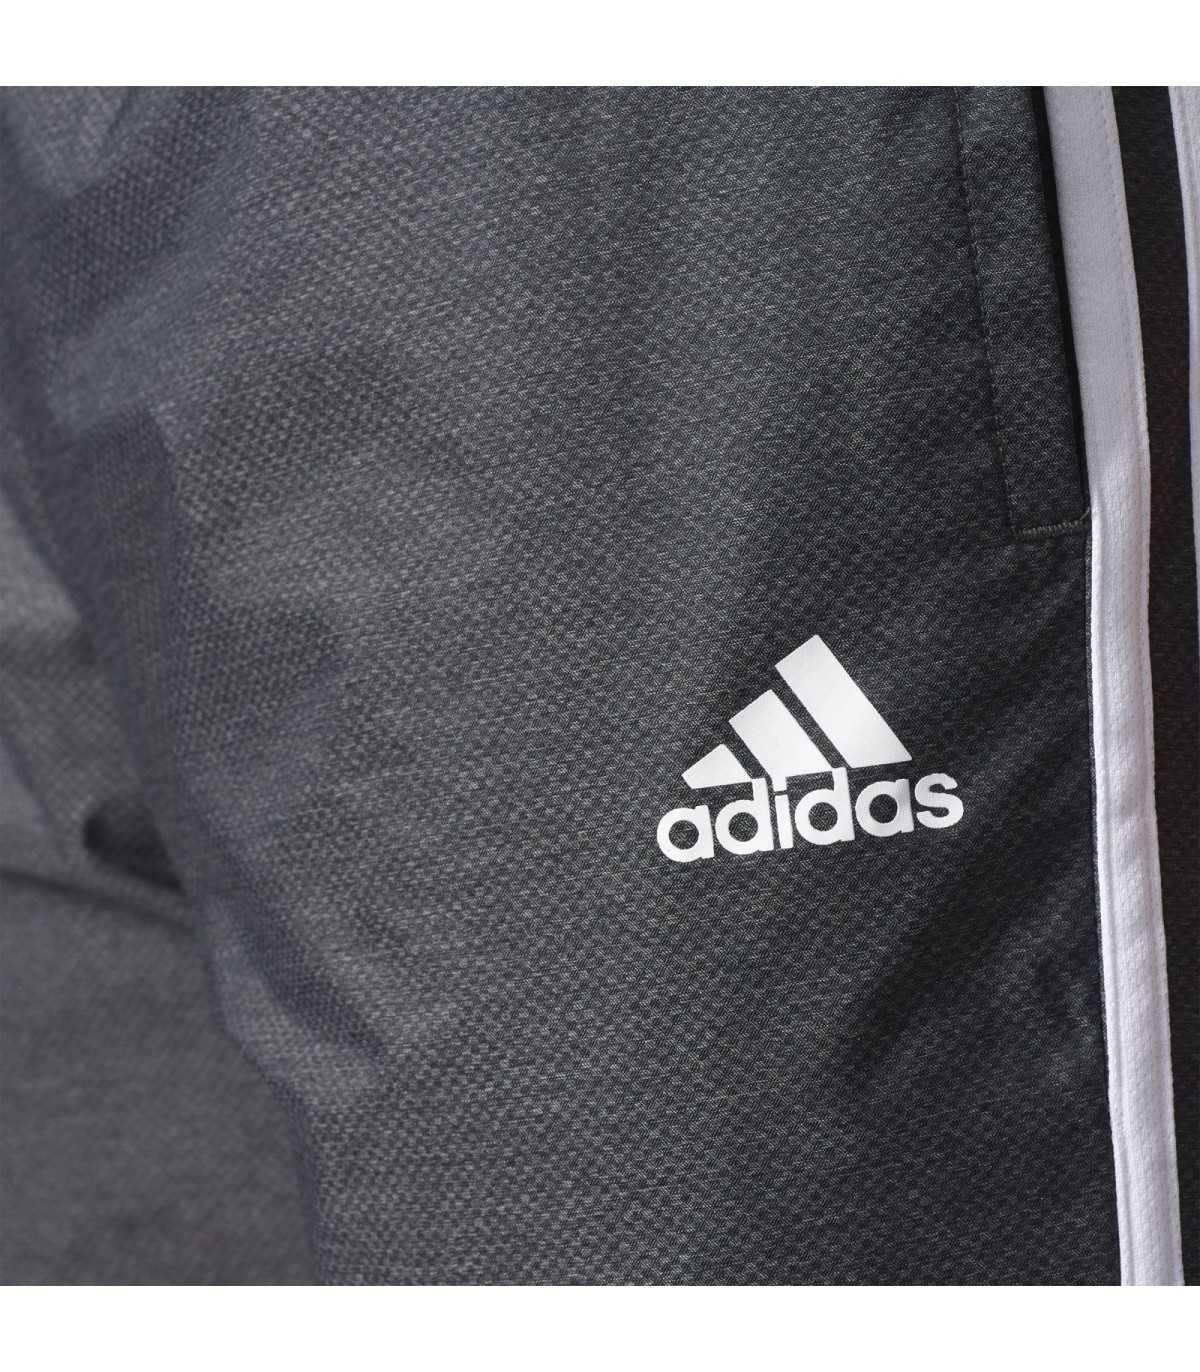 Ess 3s Pant Wvn Adidas Pantalon vy7gYbf6